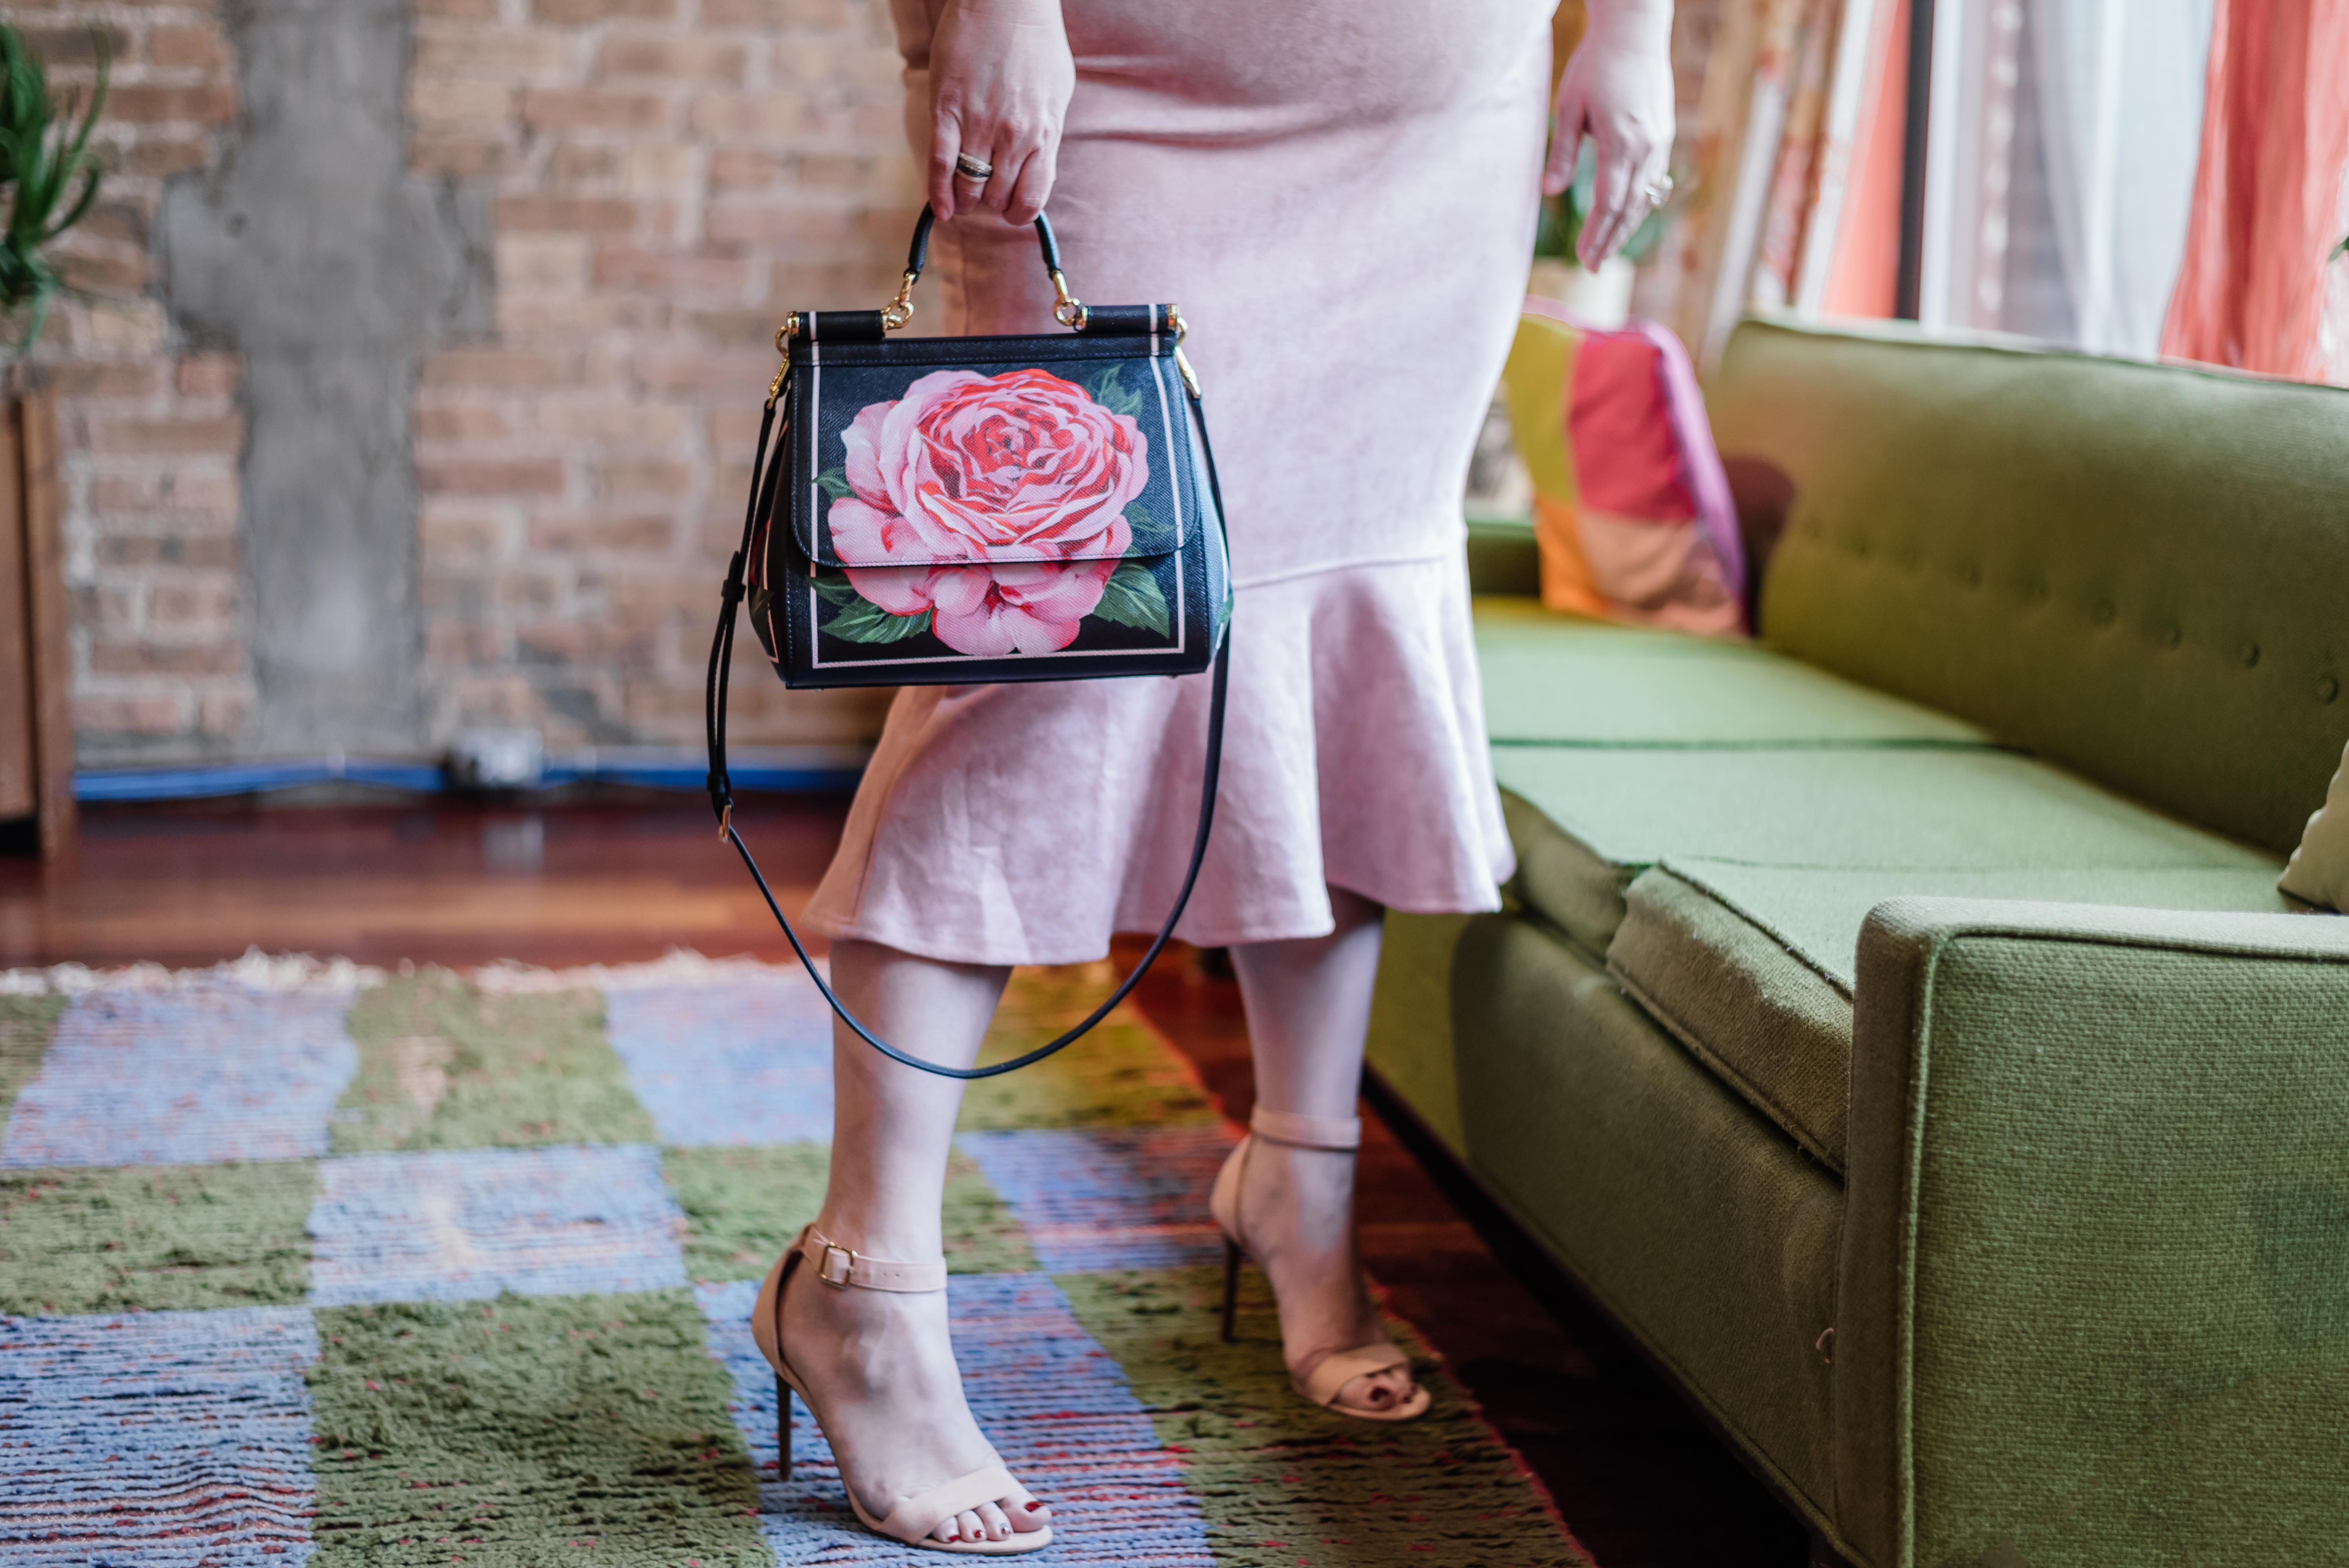 Dolce & Gabbana Rose Painted Purse, Fashion Nova Curve dress, Valentine's Day Style